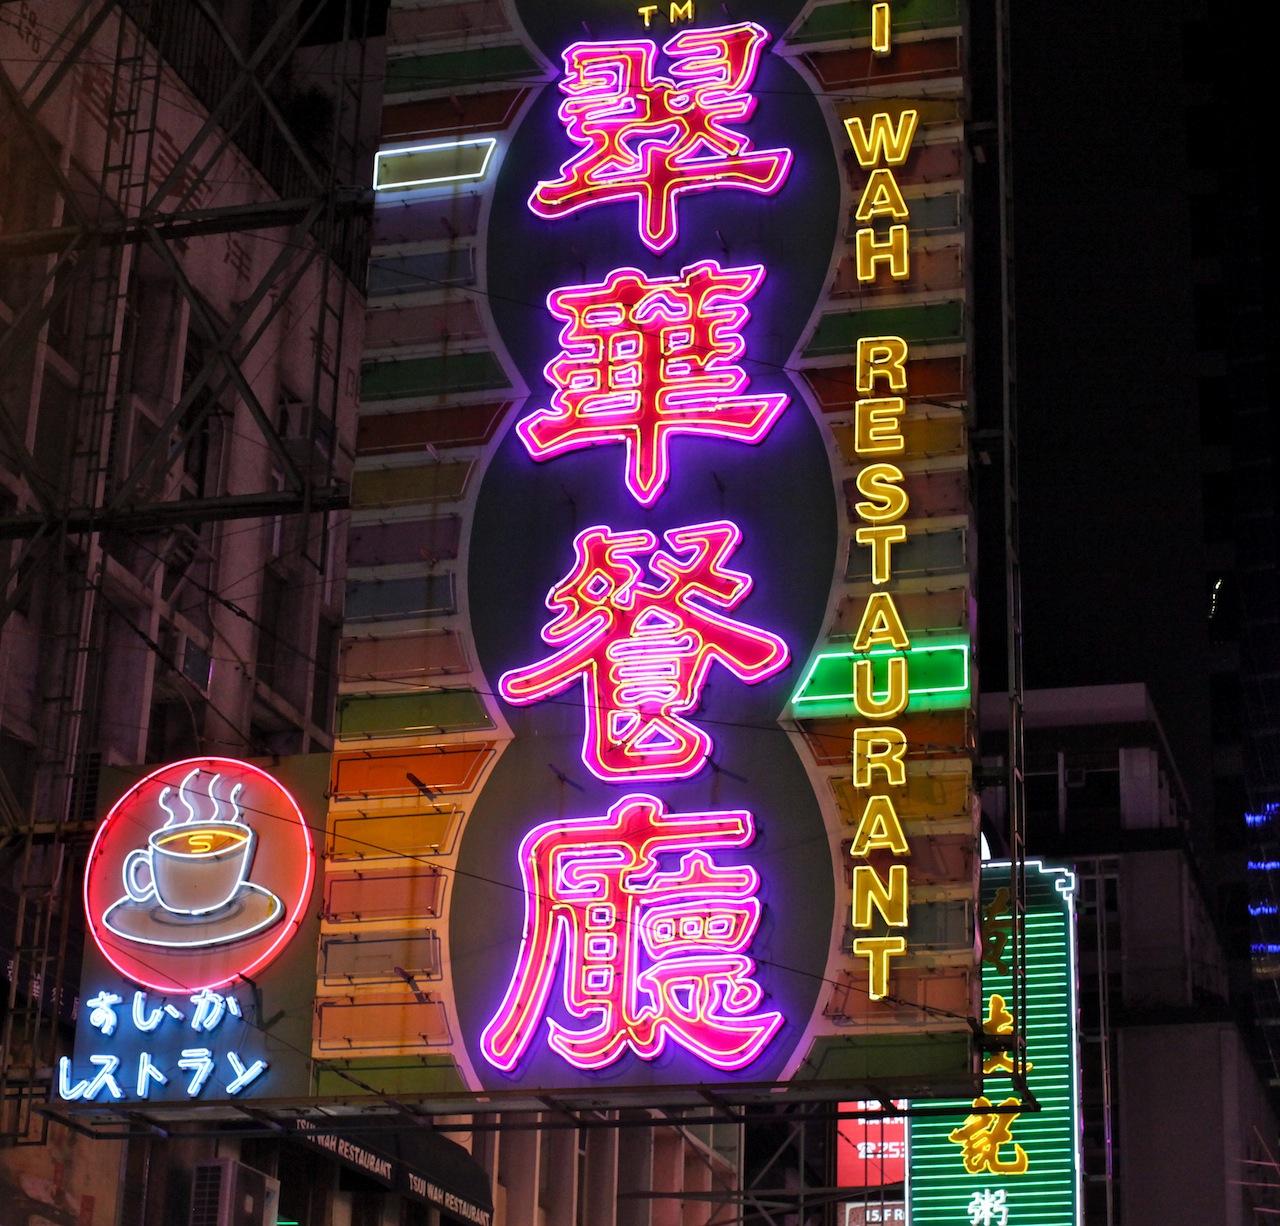 Restaurant sign in Hong Kong (photograph by torbakhopper, via Flickr)